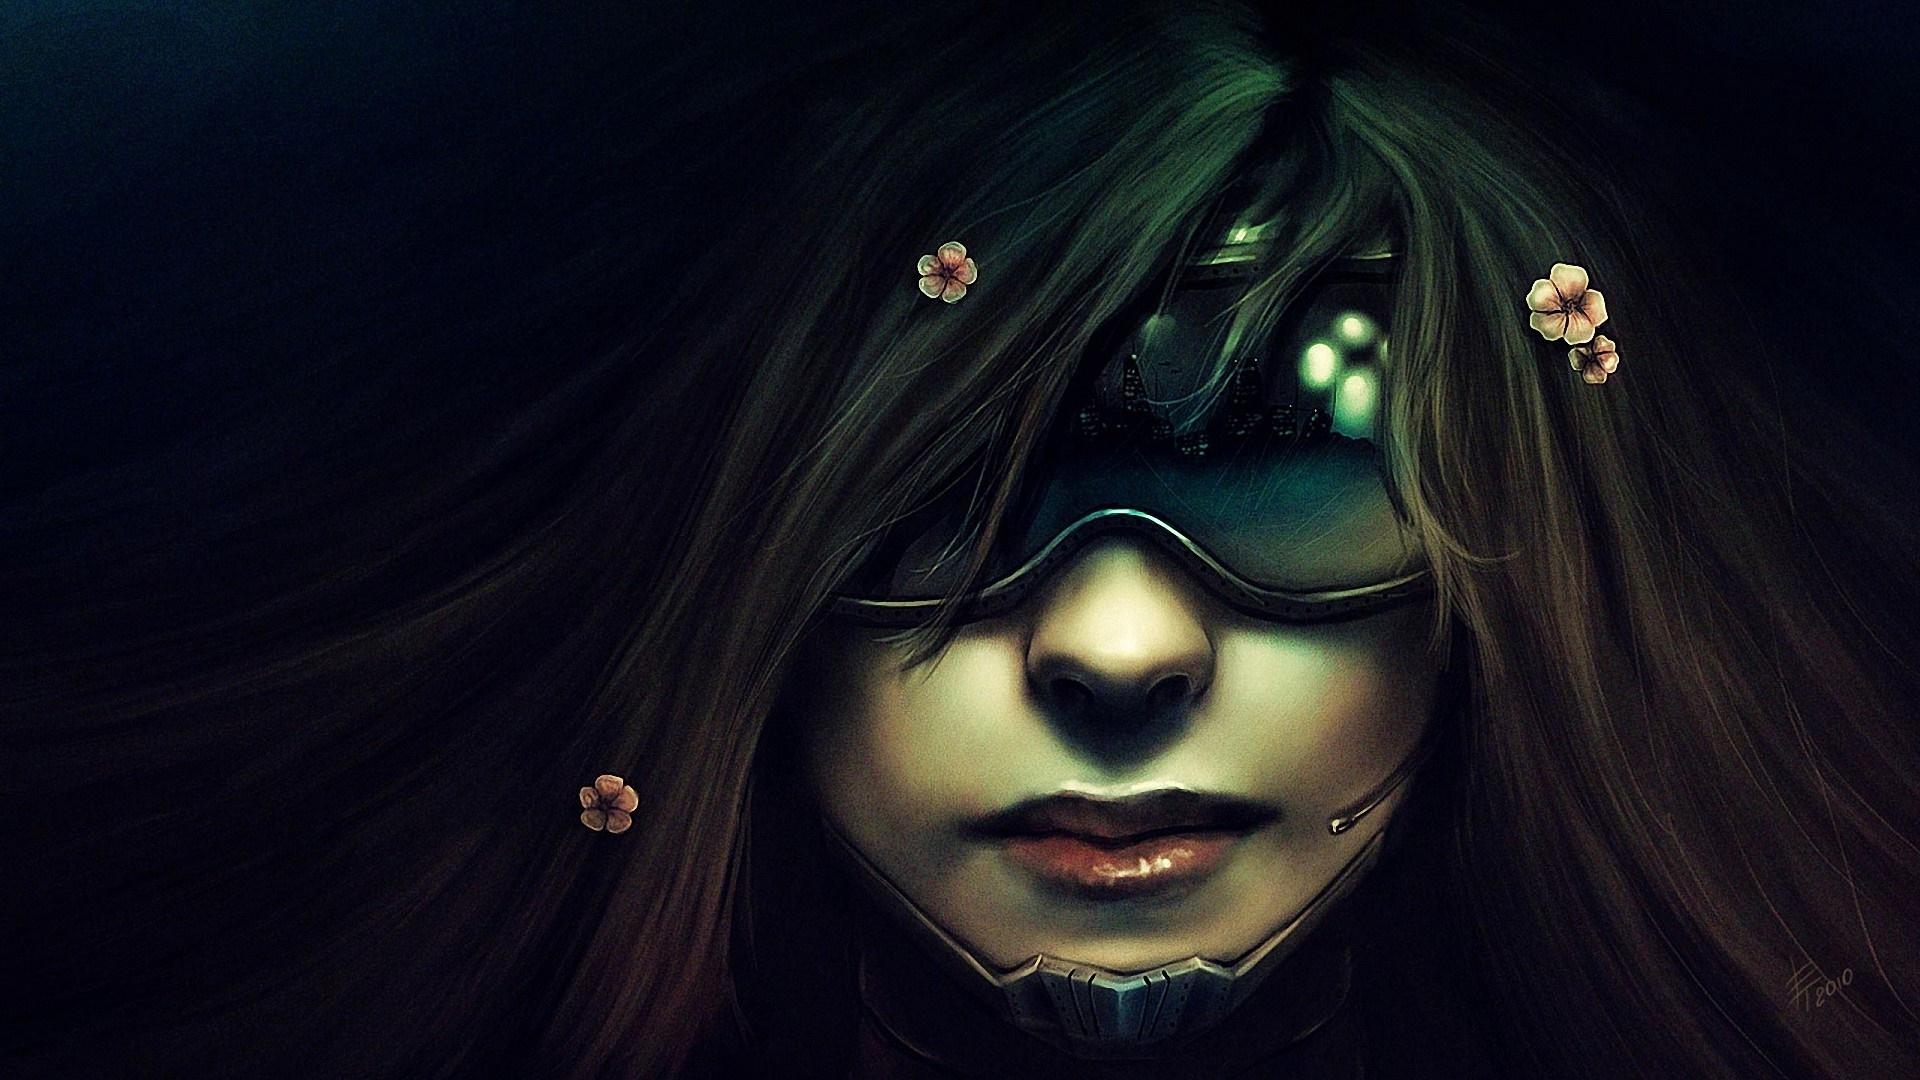 Futuristic cyberpunk asian girl wallpaper